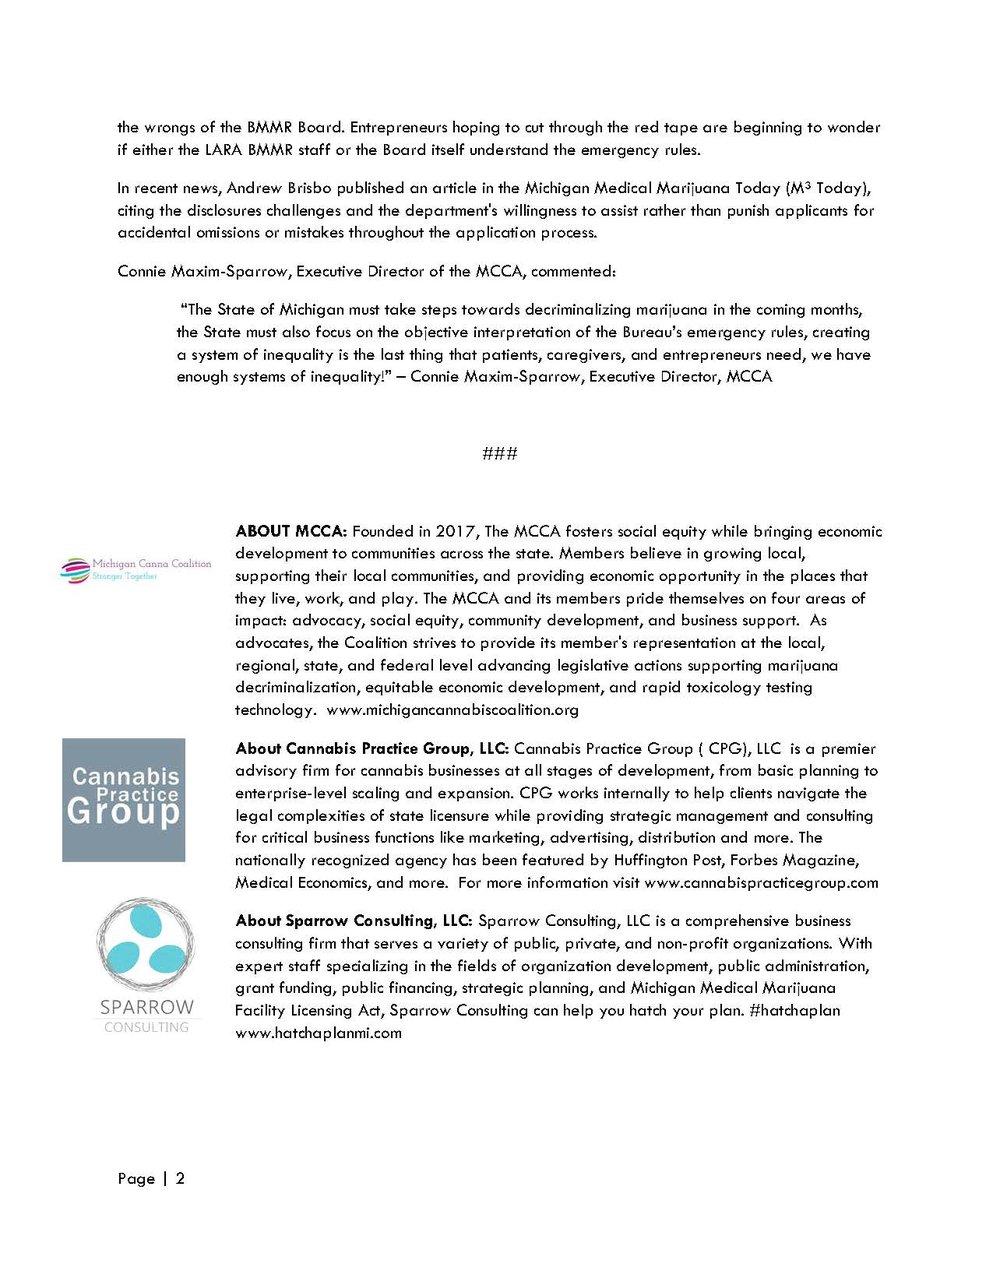 MCCA A and K Enterprises Press Release FINAL v.4_Page_2.jpg